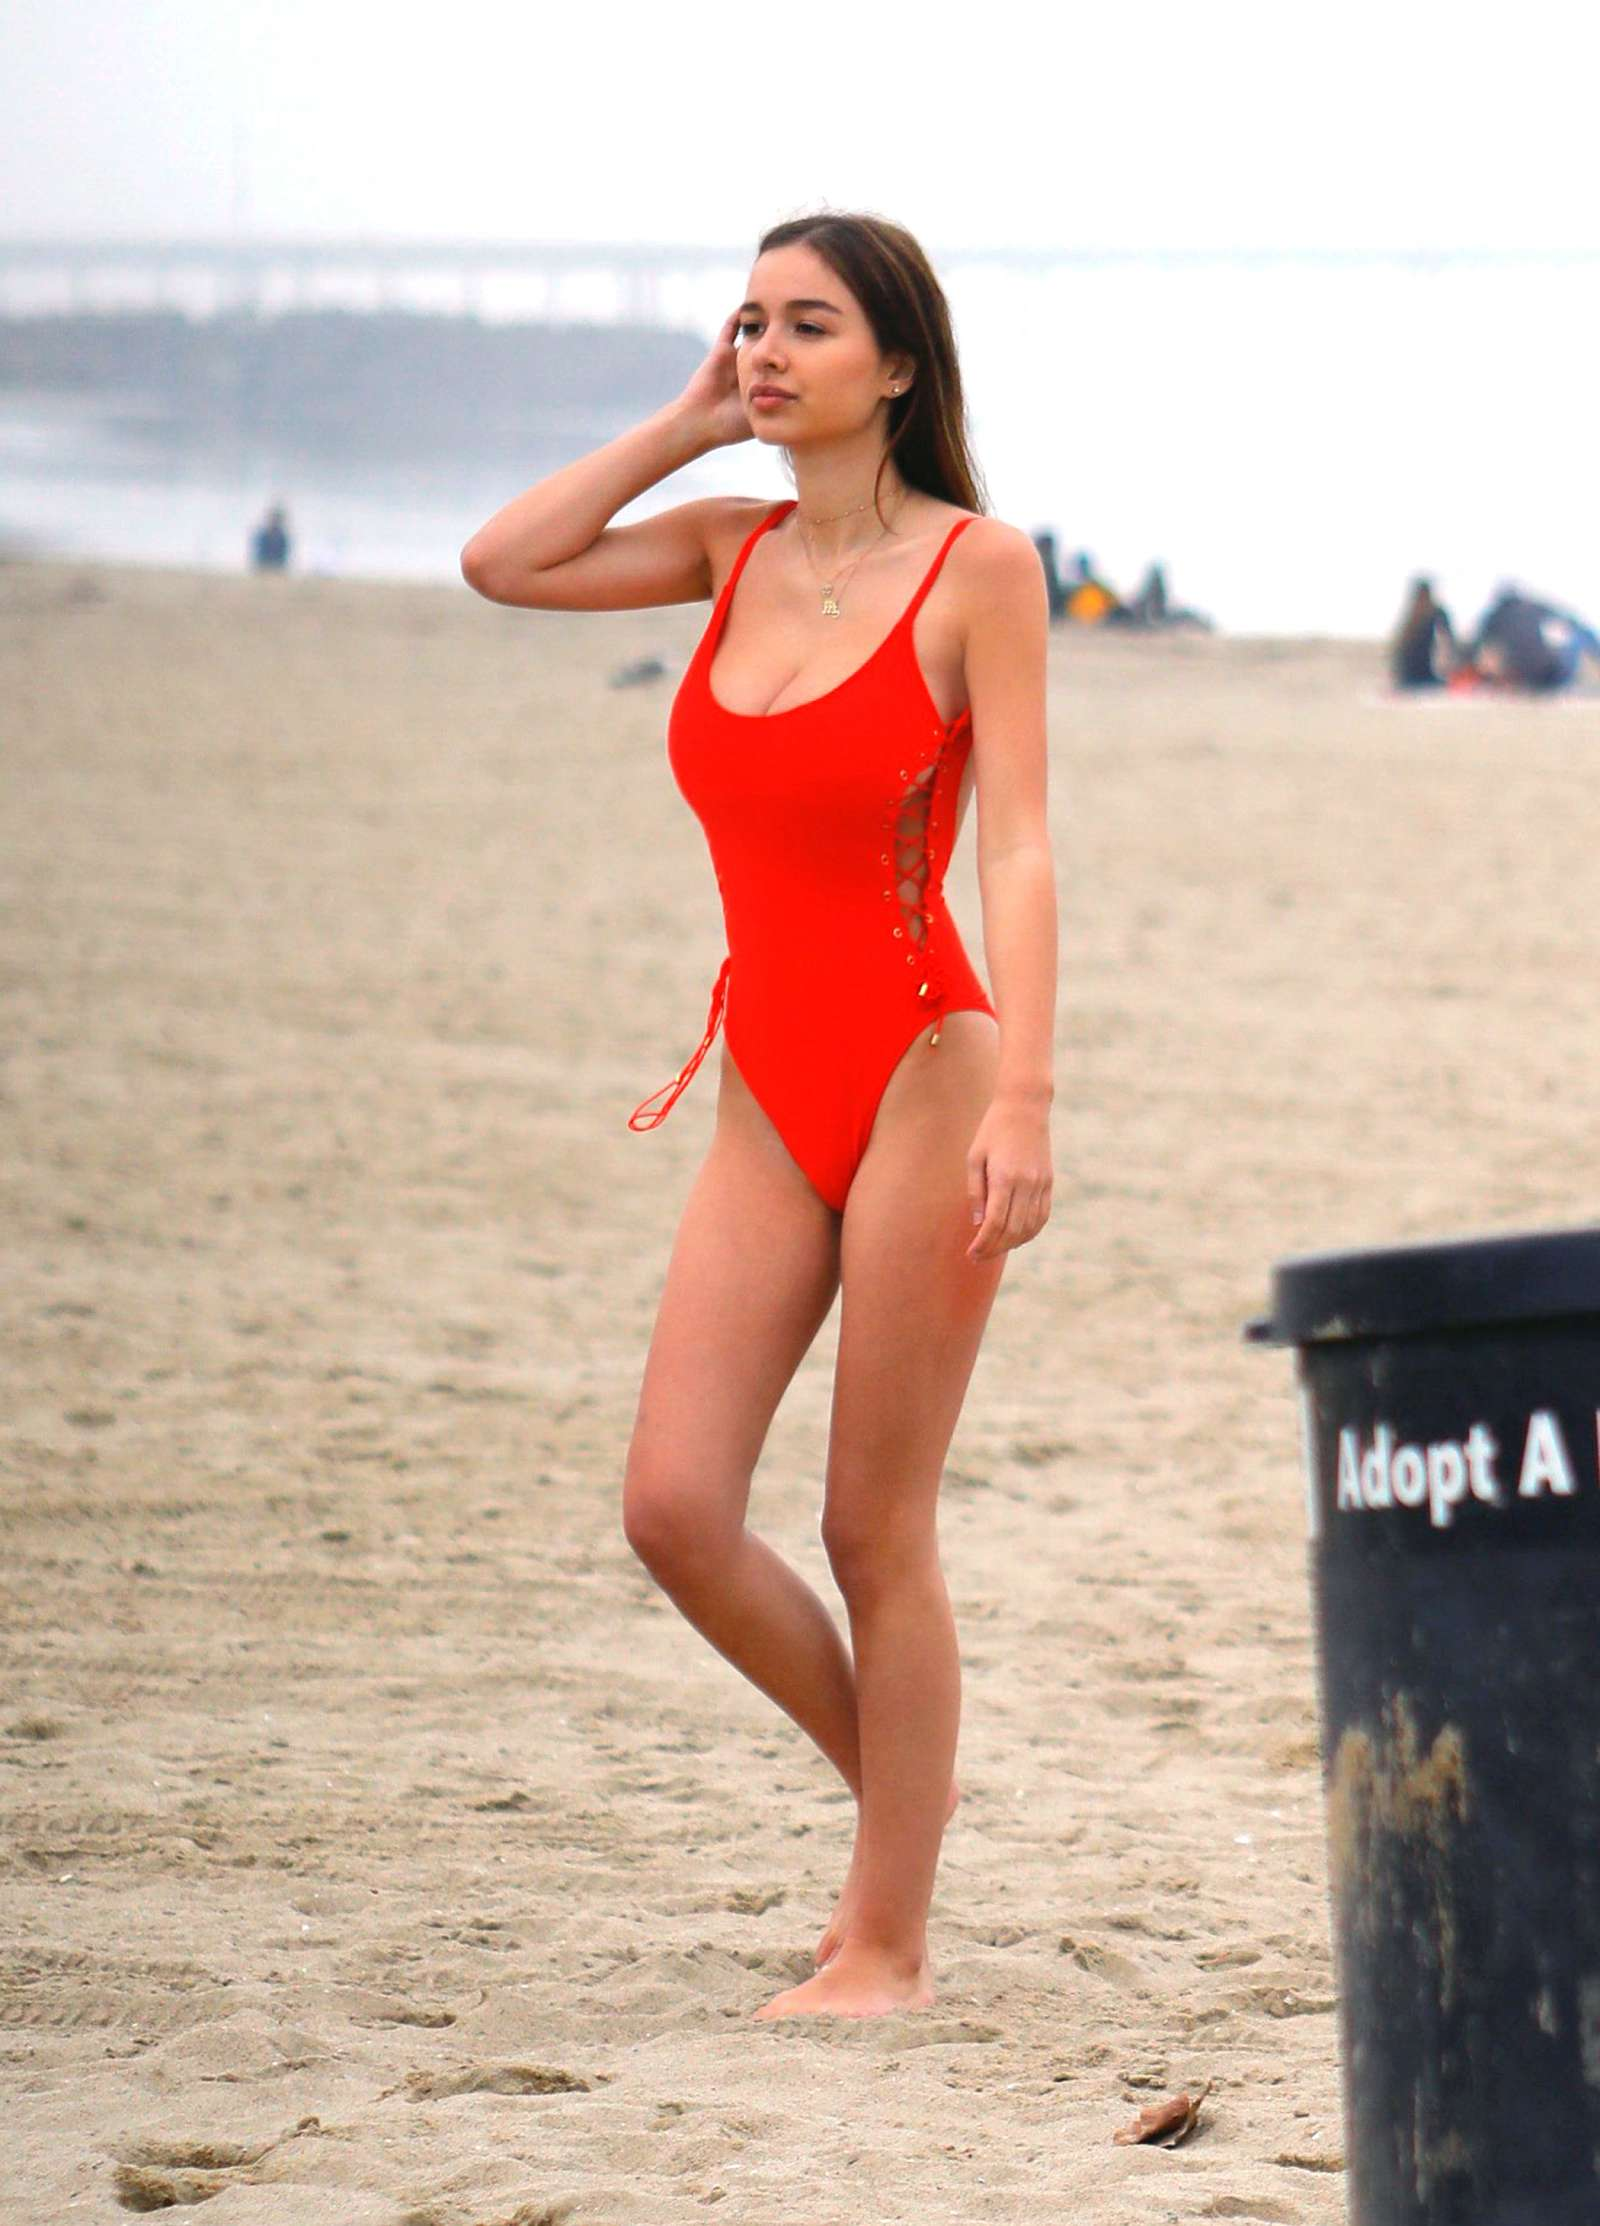 Sophie Mudd in Red Bikini on the beach in Malibu Pic 9 of 35